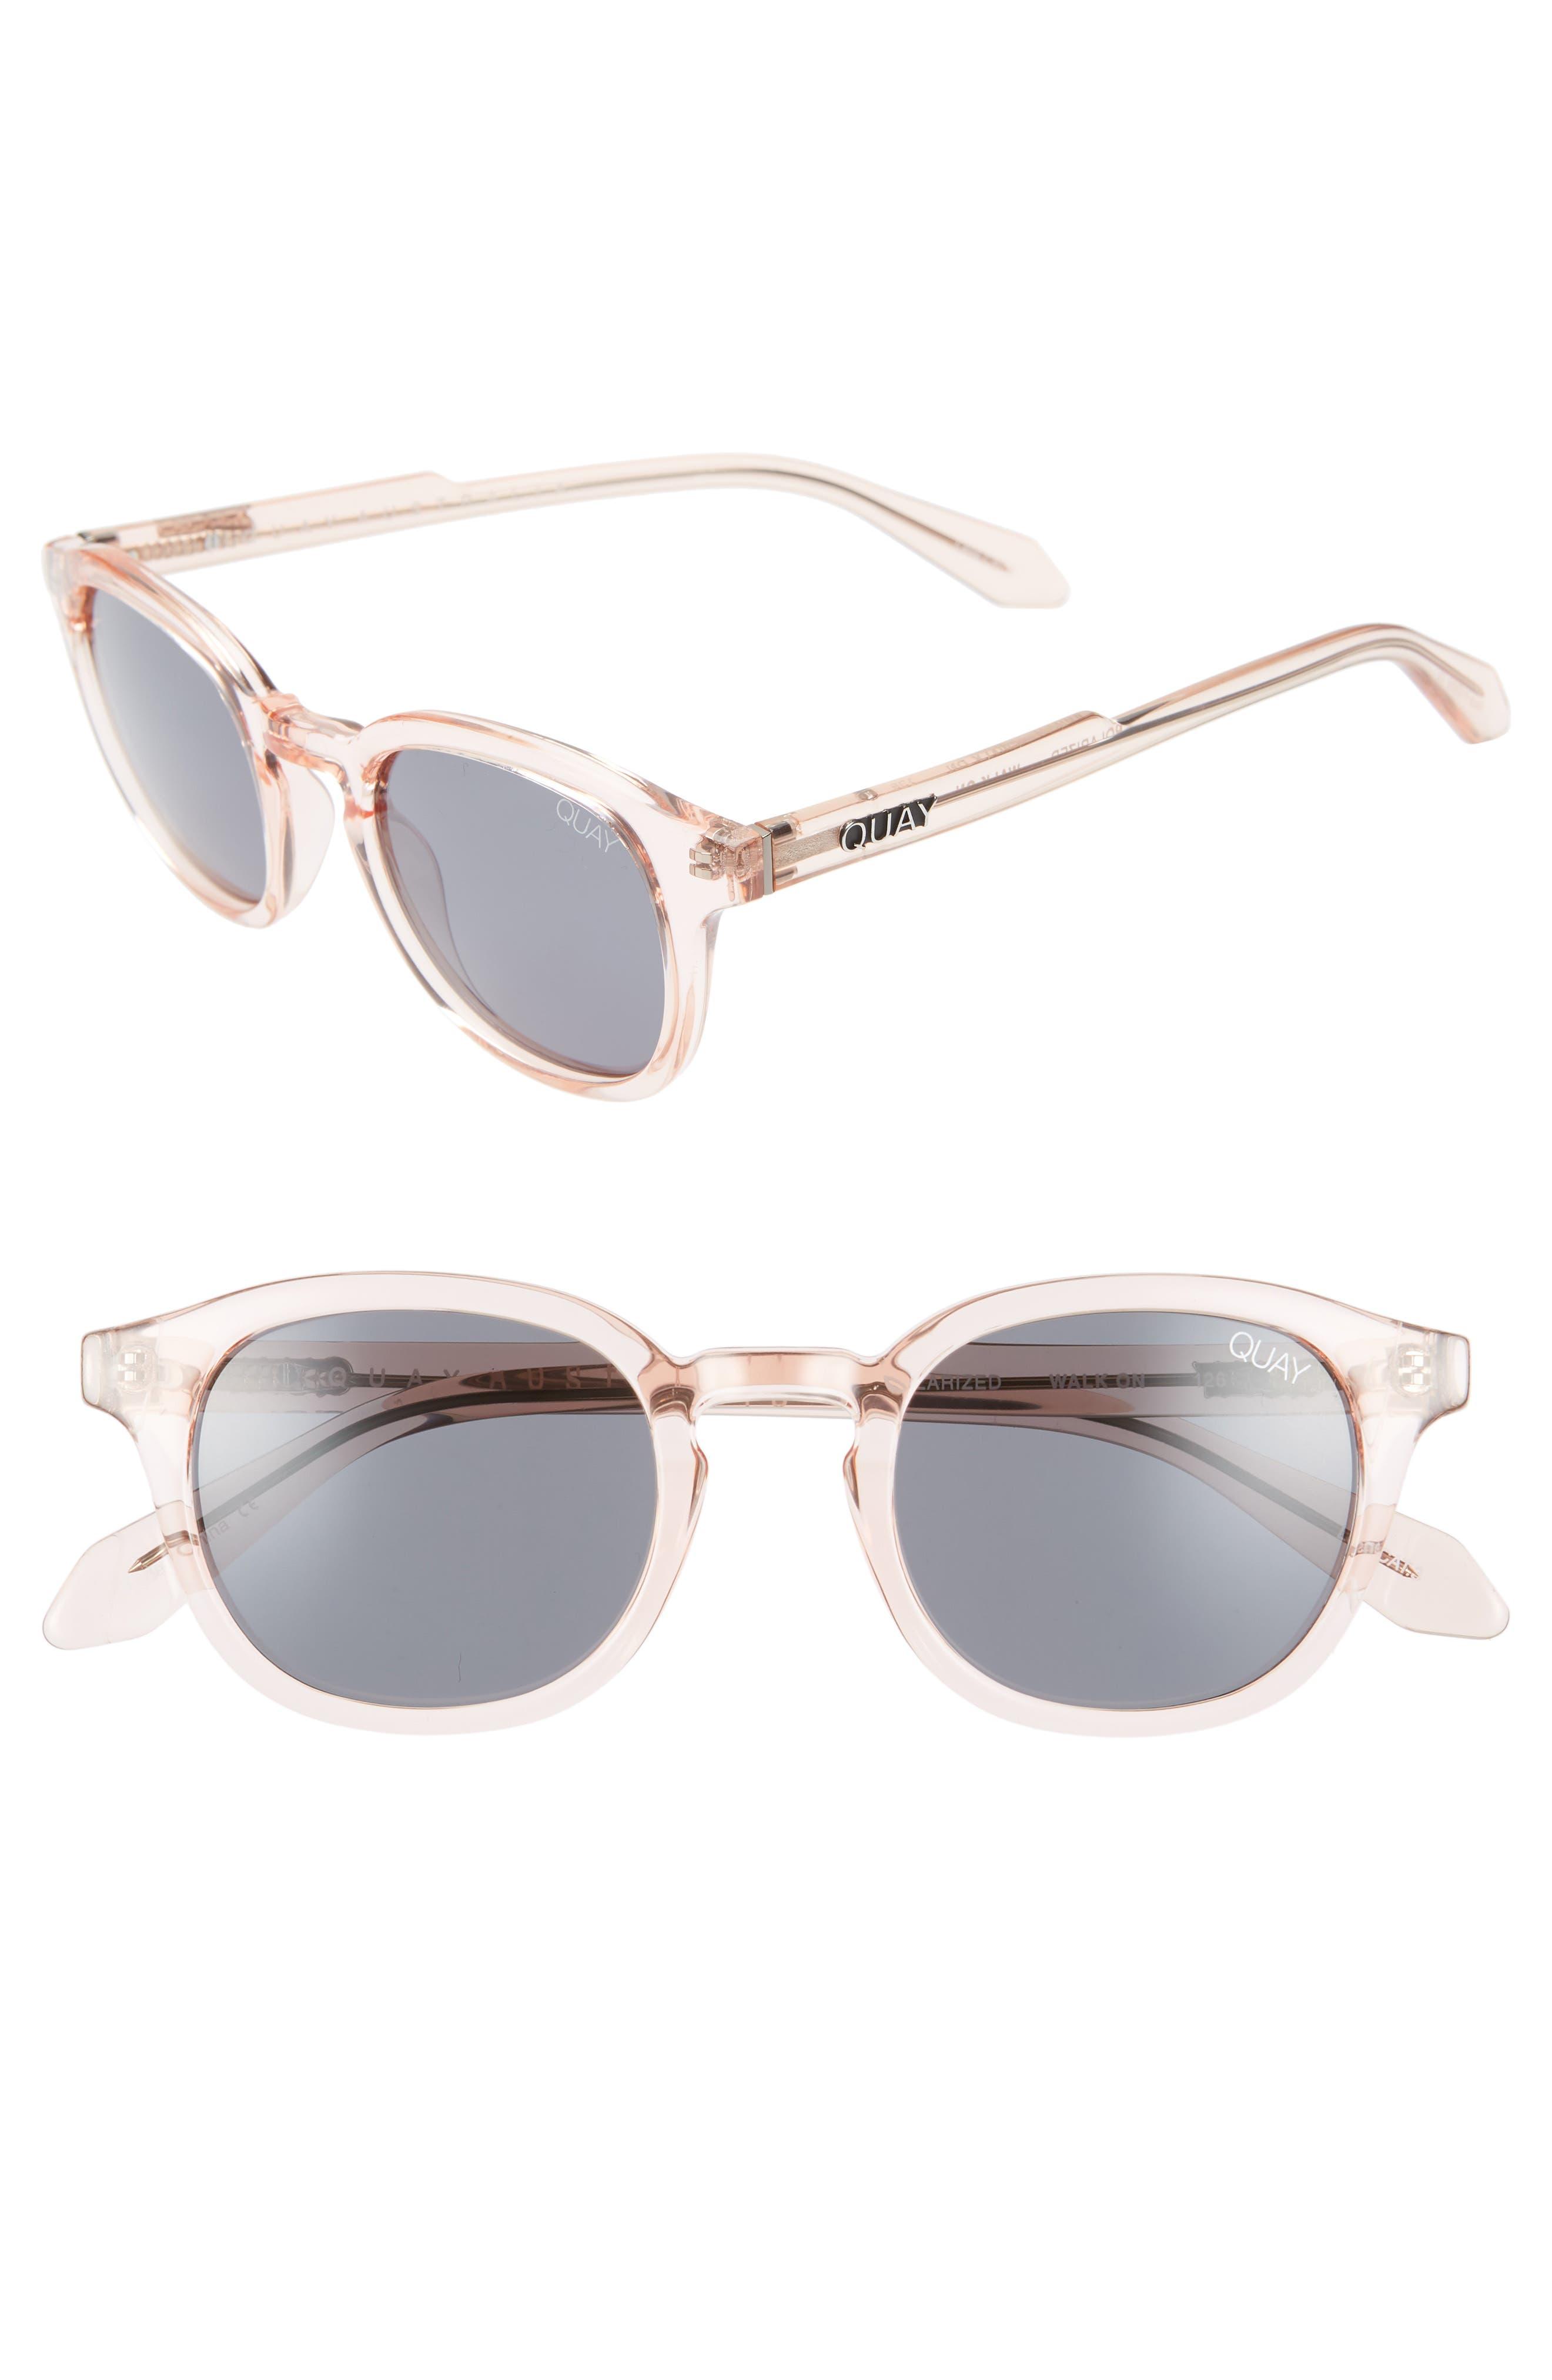 ebde17f0b0 Quay Women s Round Sunglasses